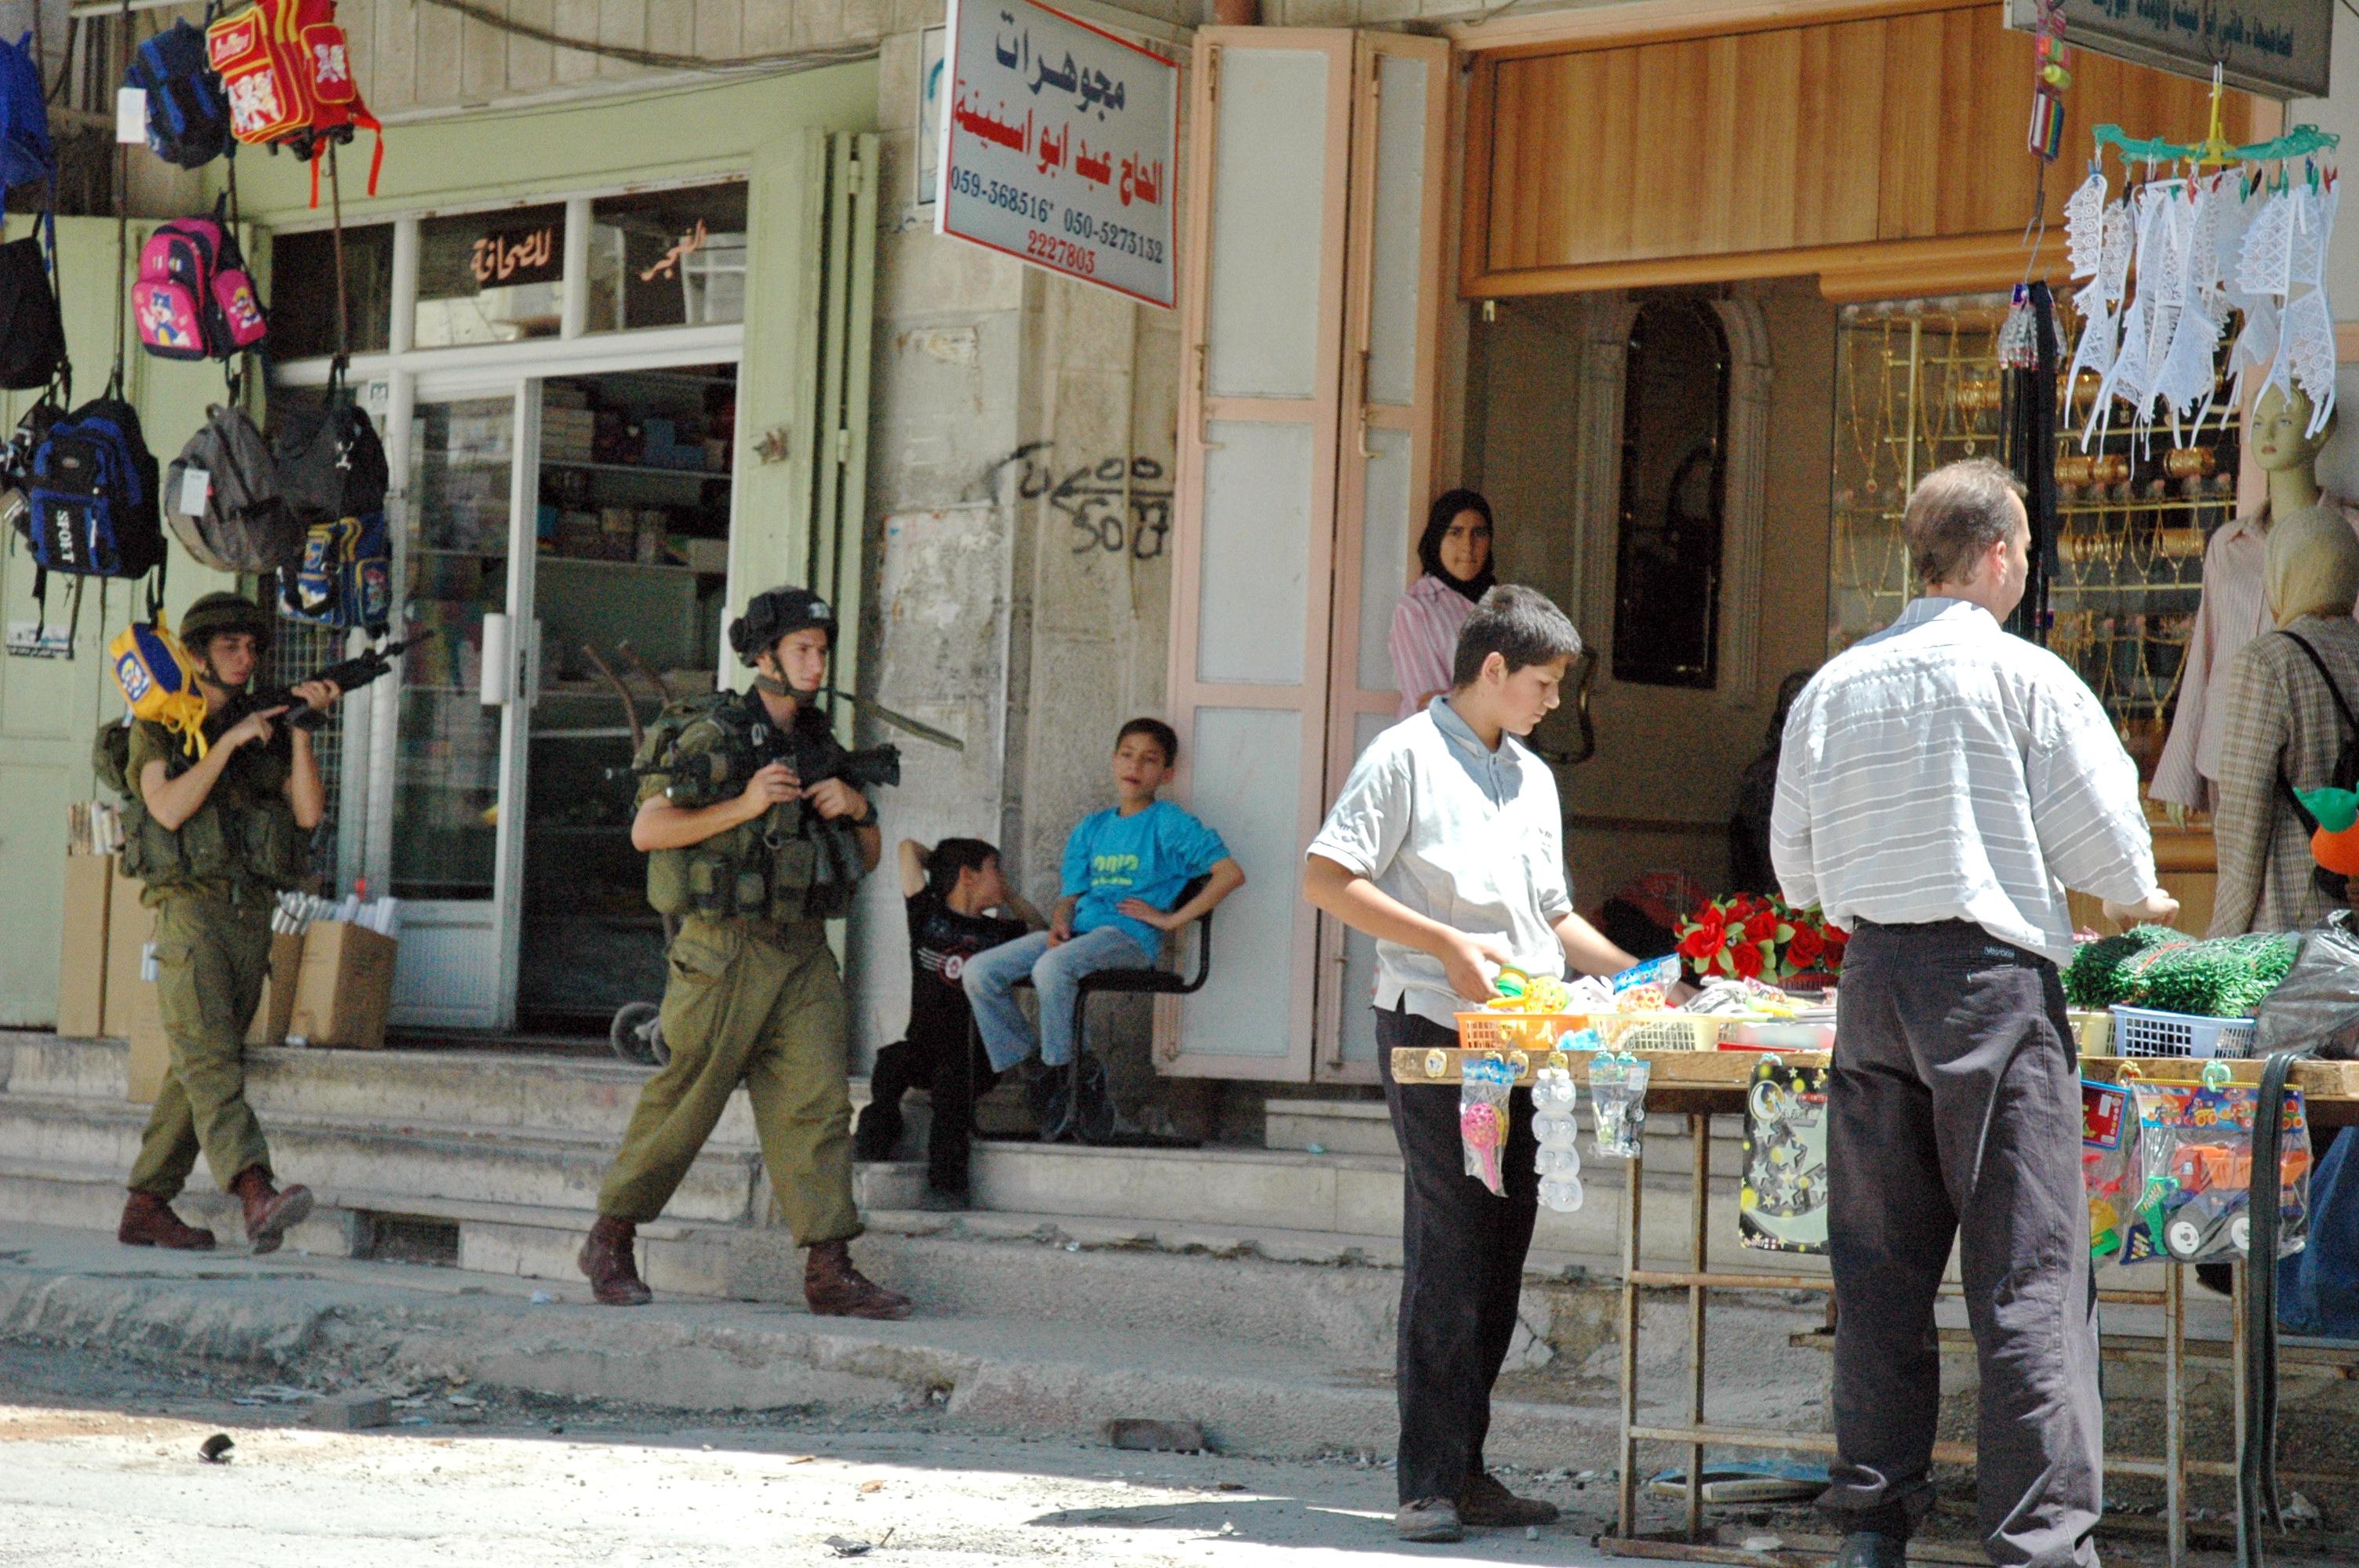 Israeli soldiers in Palstinian city of Hebron, 2004. (Wikimedia)